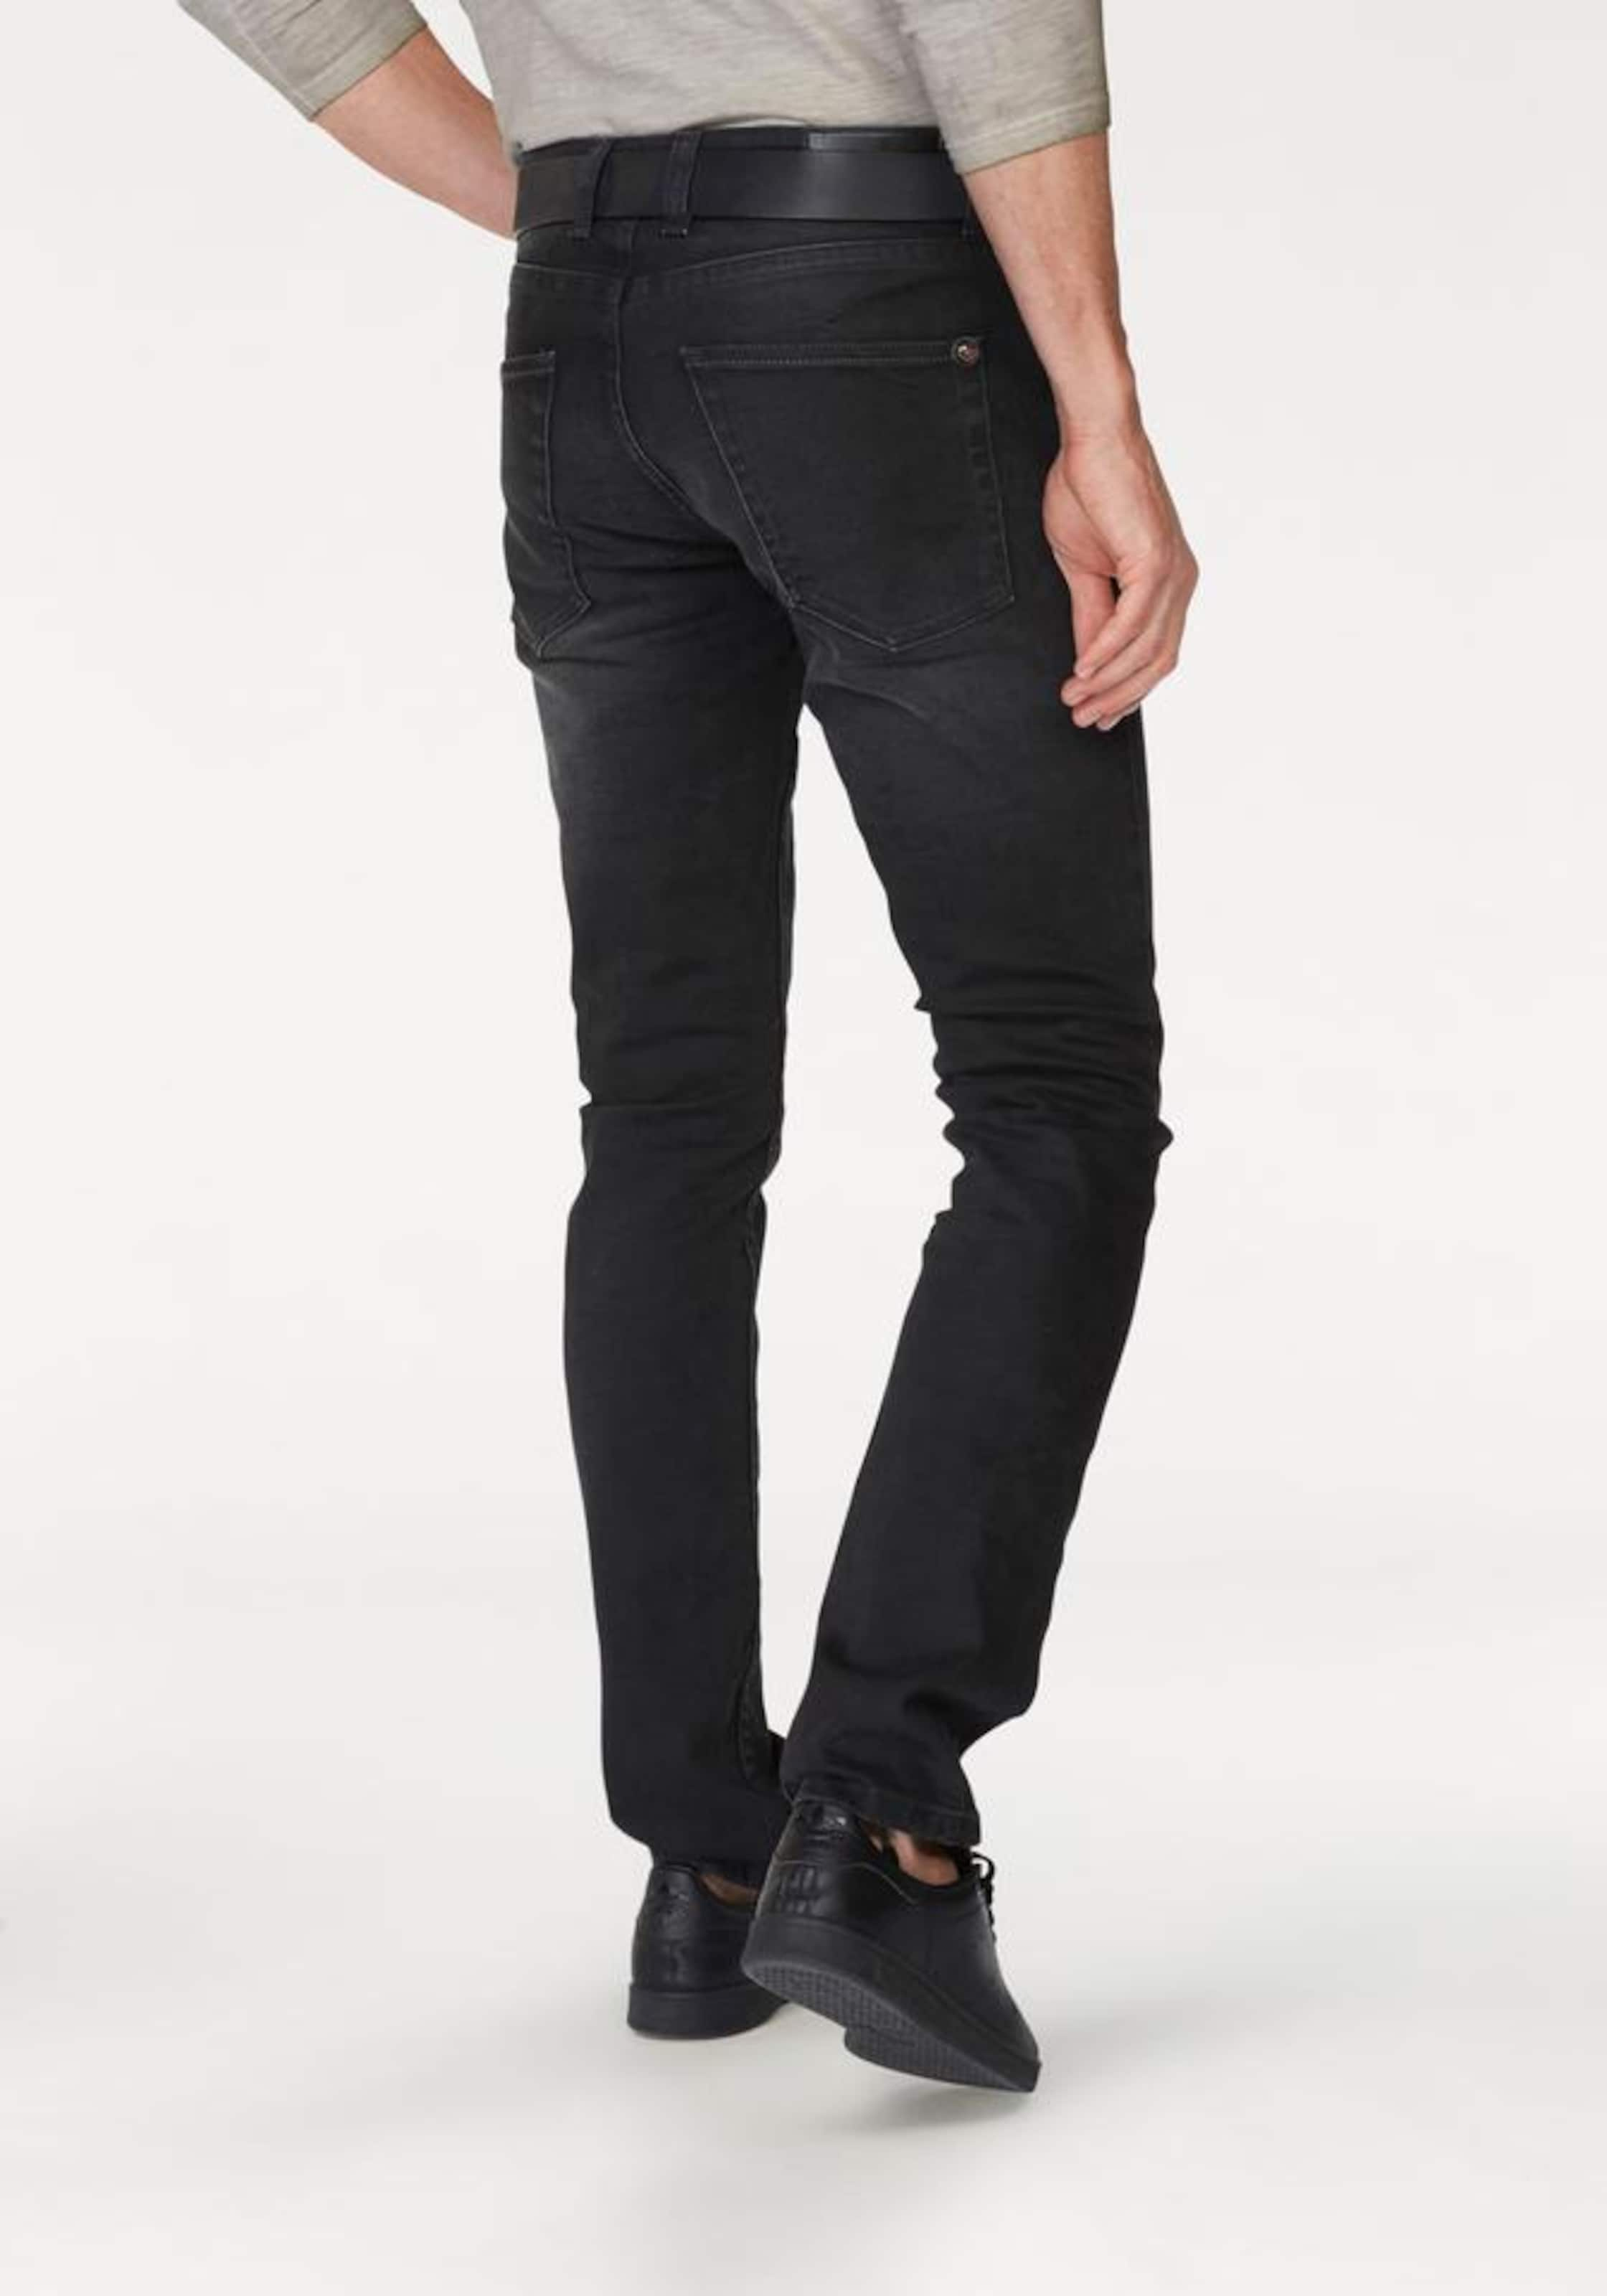 Slim fit Jeans BRUNO BRUNO BANANI BANANI Slim fit 'Jimmy' UAxqwSXYq